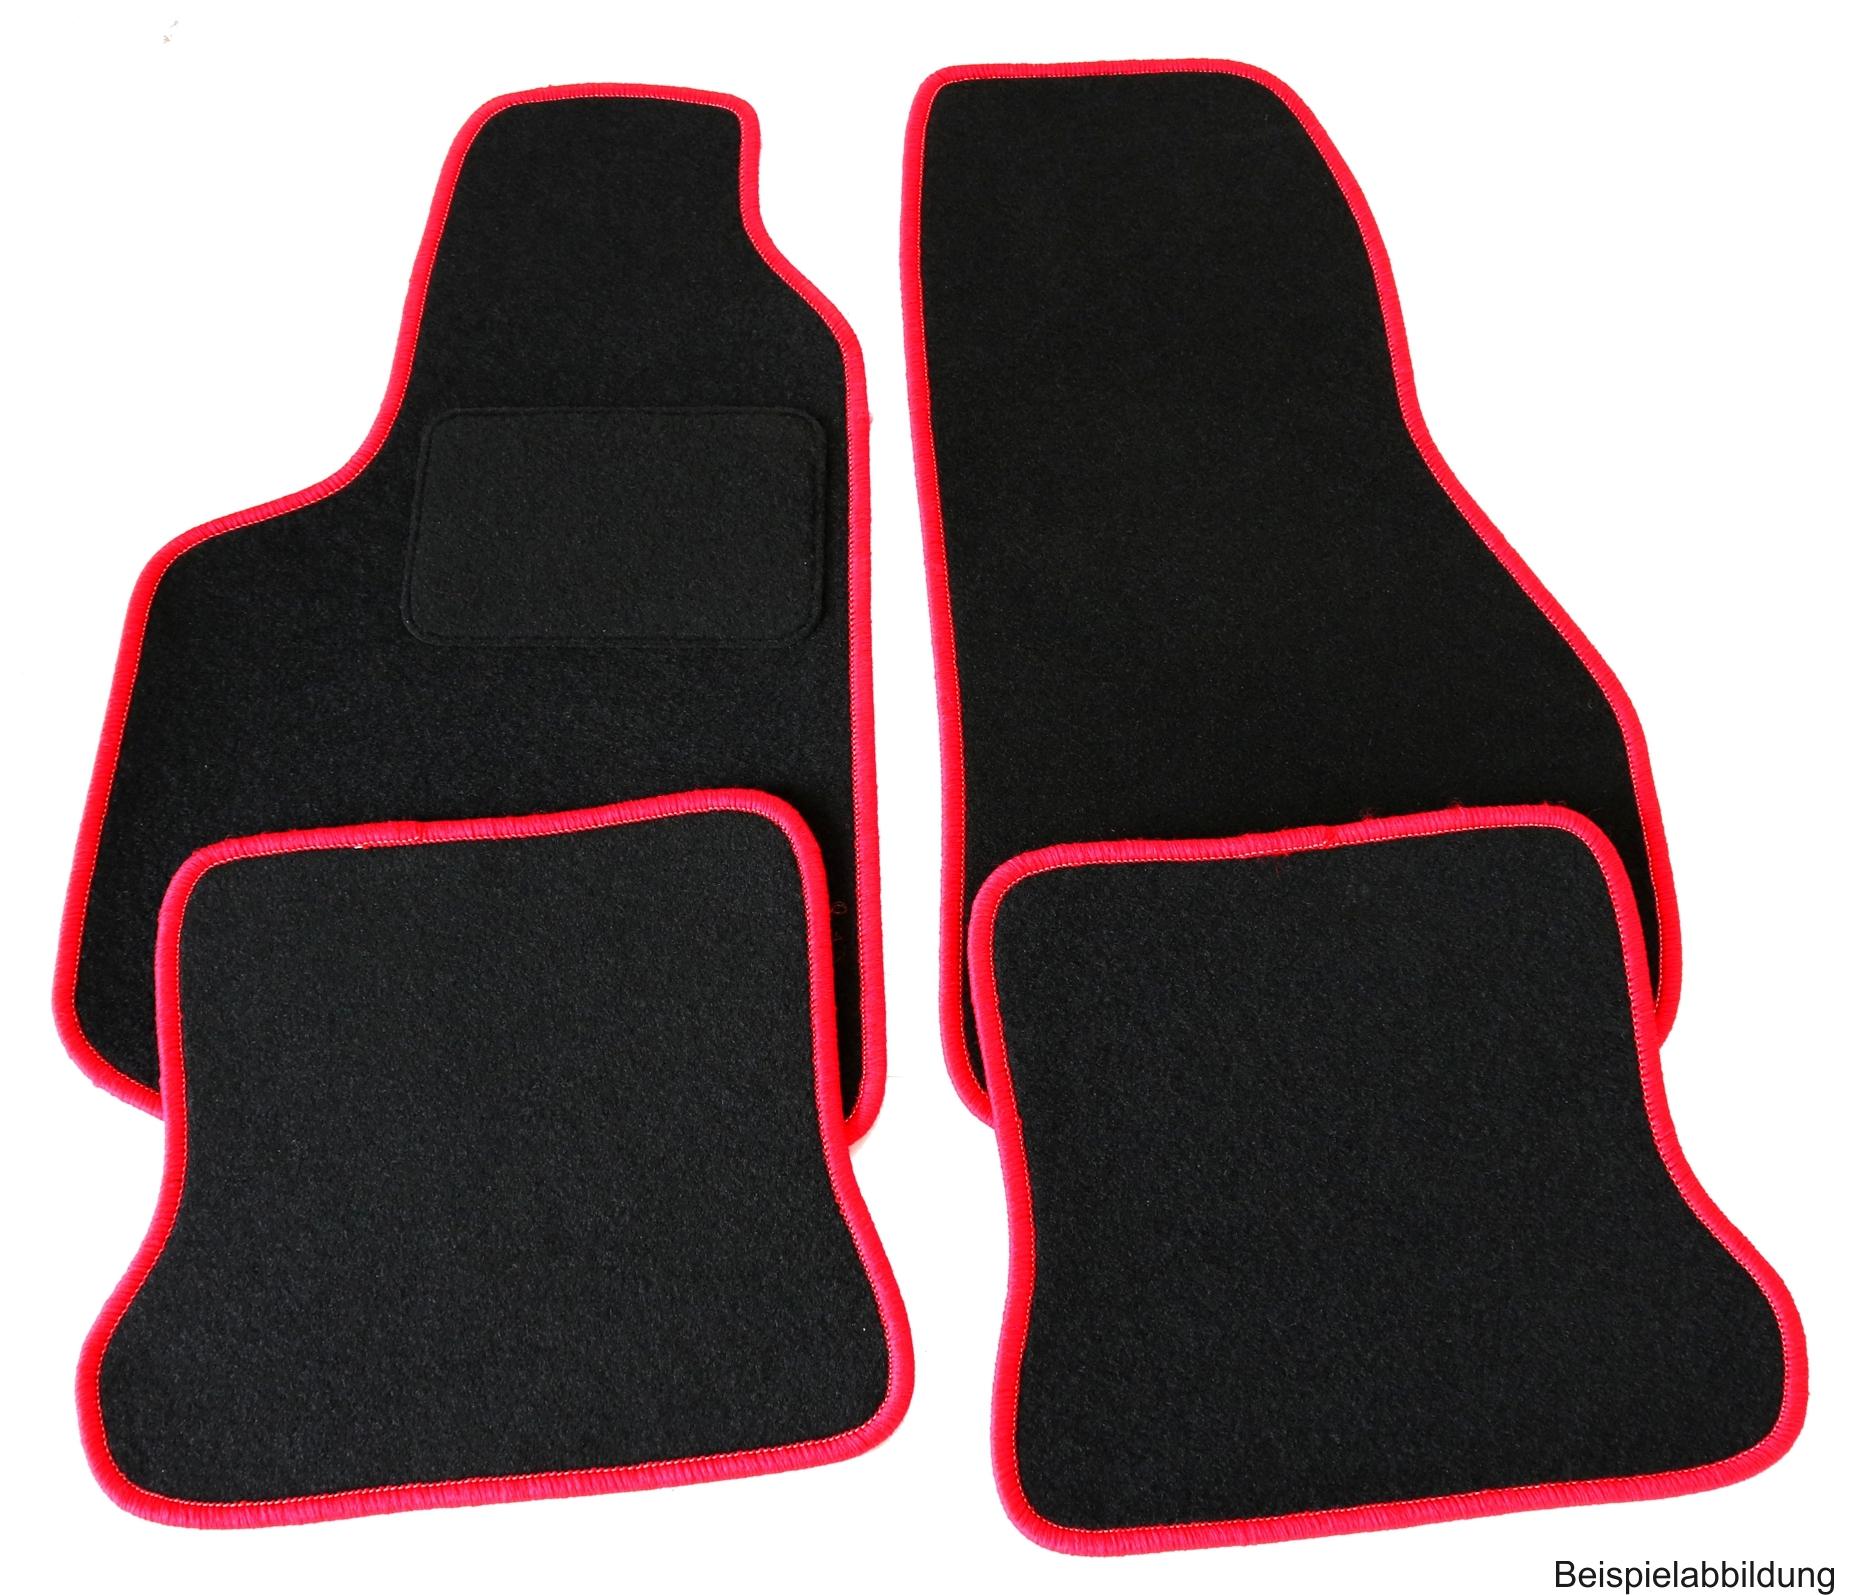 velours fu matten set f r vw golf 6 cabrio 4 teilig rand. Black Bedroom Furniture Sets. Home Design Ideas